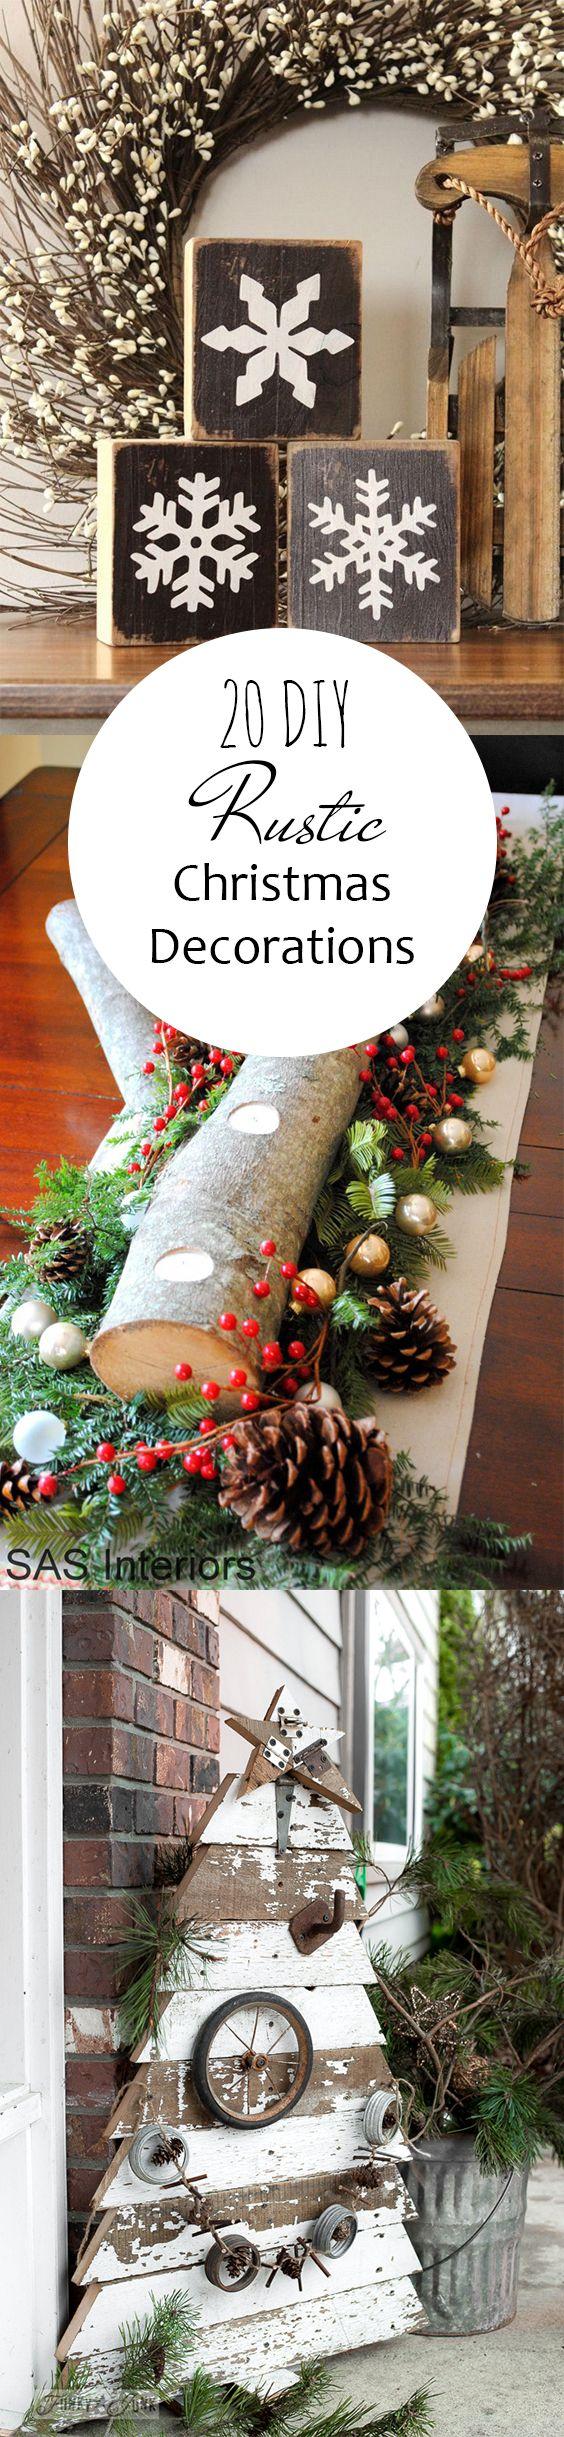 Homemade rustic christmas ornaments - Pin 20 Diy Rustic Christmas Decorations